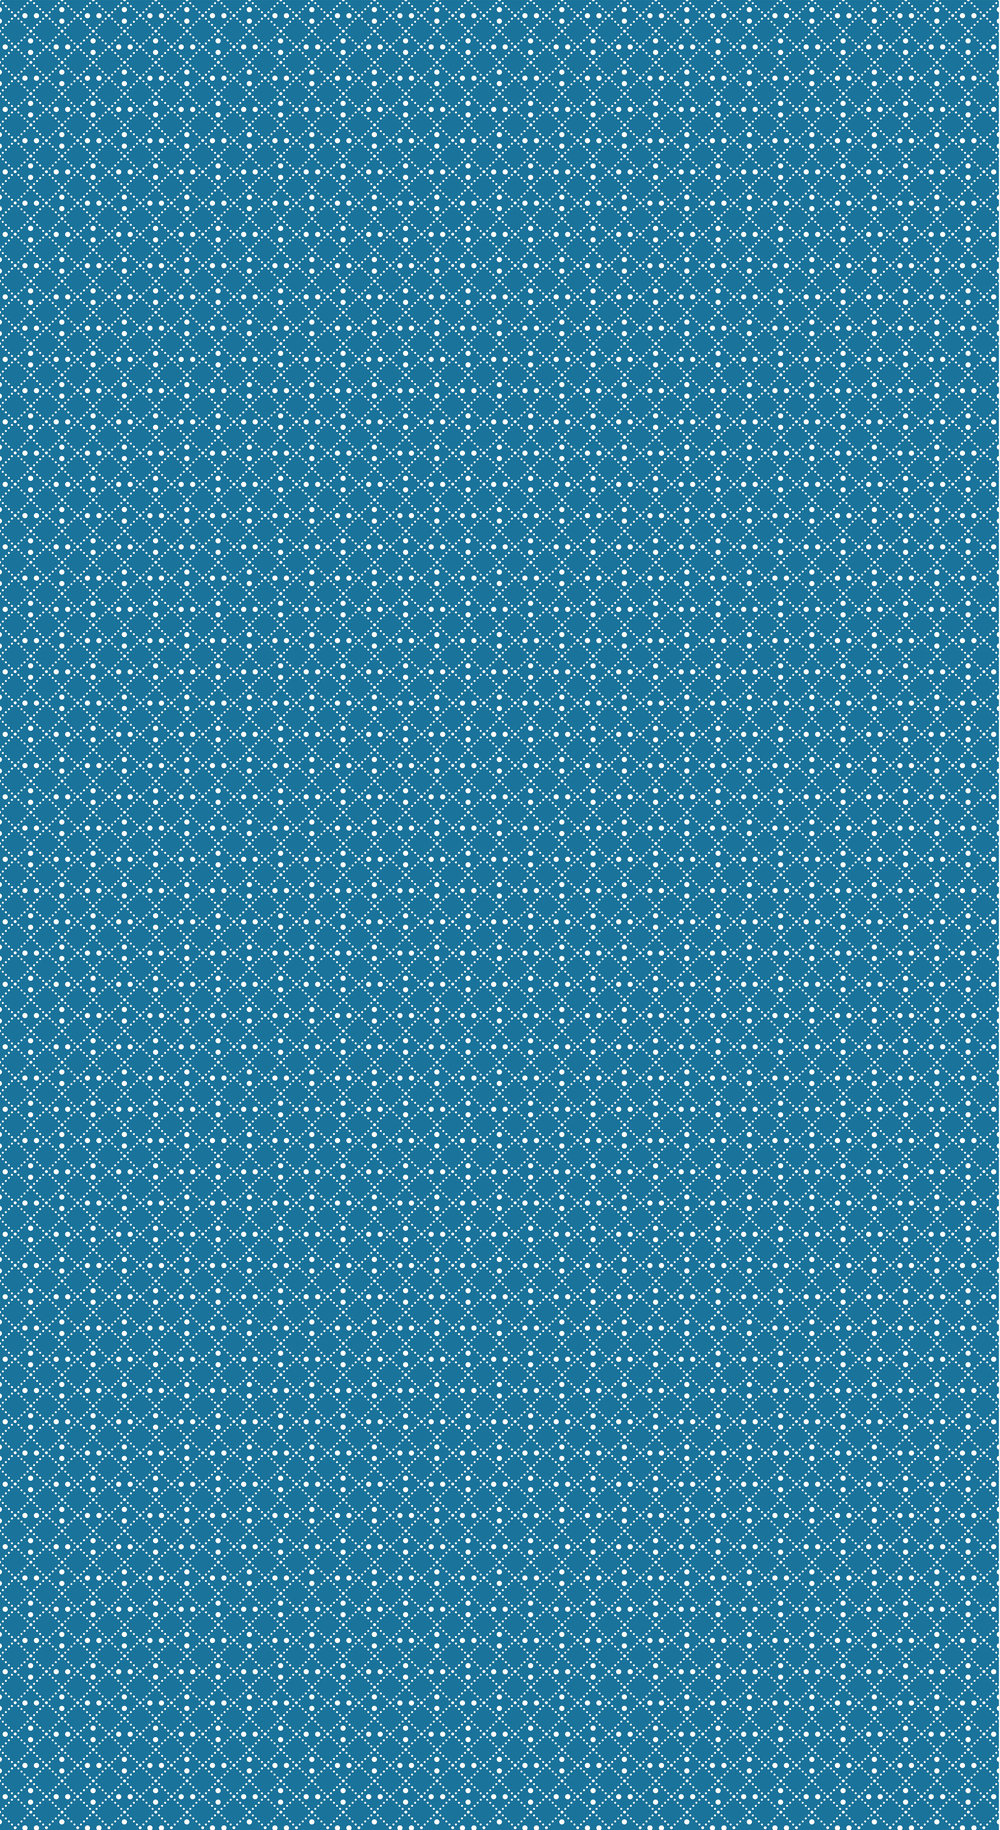 3526-002 PLOTTING-DUSK